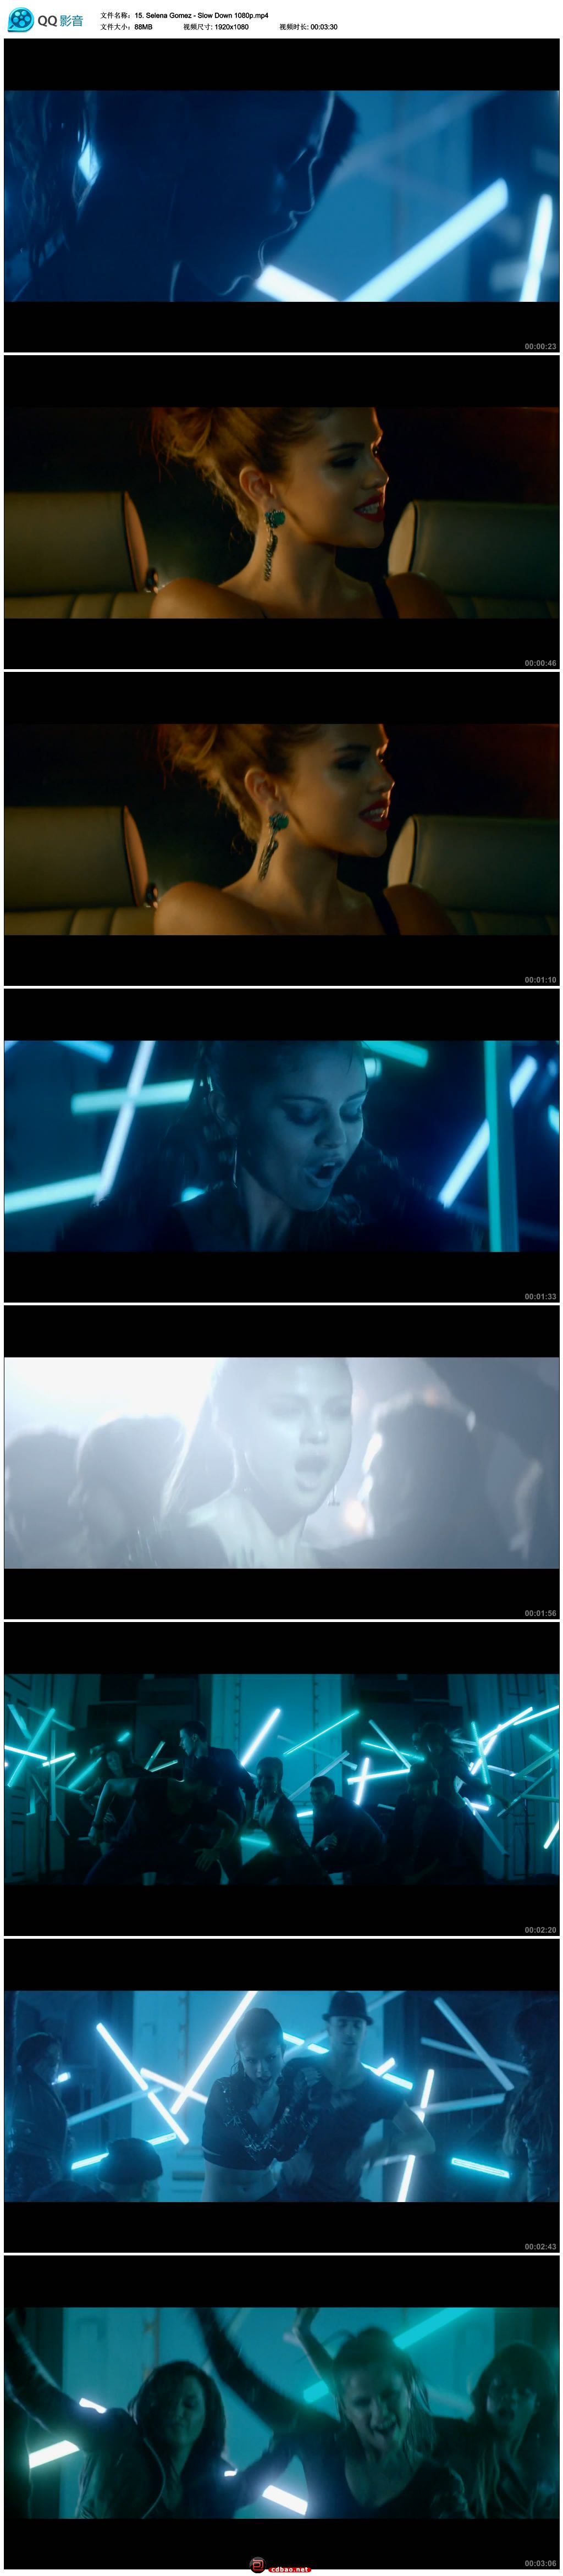 15. Selena Gomez - Slow Down 1080p.mp4_thumbs_2016.02.26.16_01_43.jpg